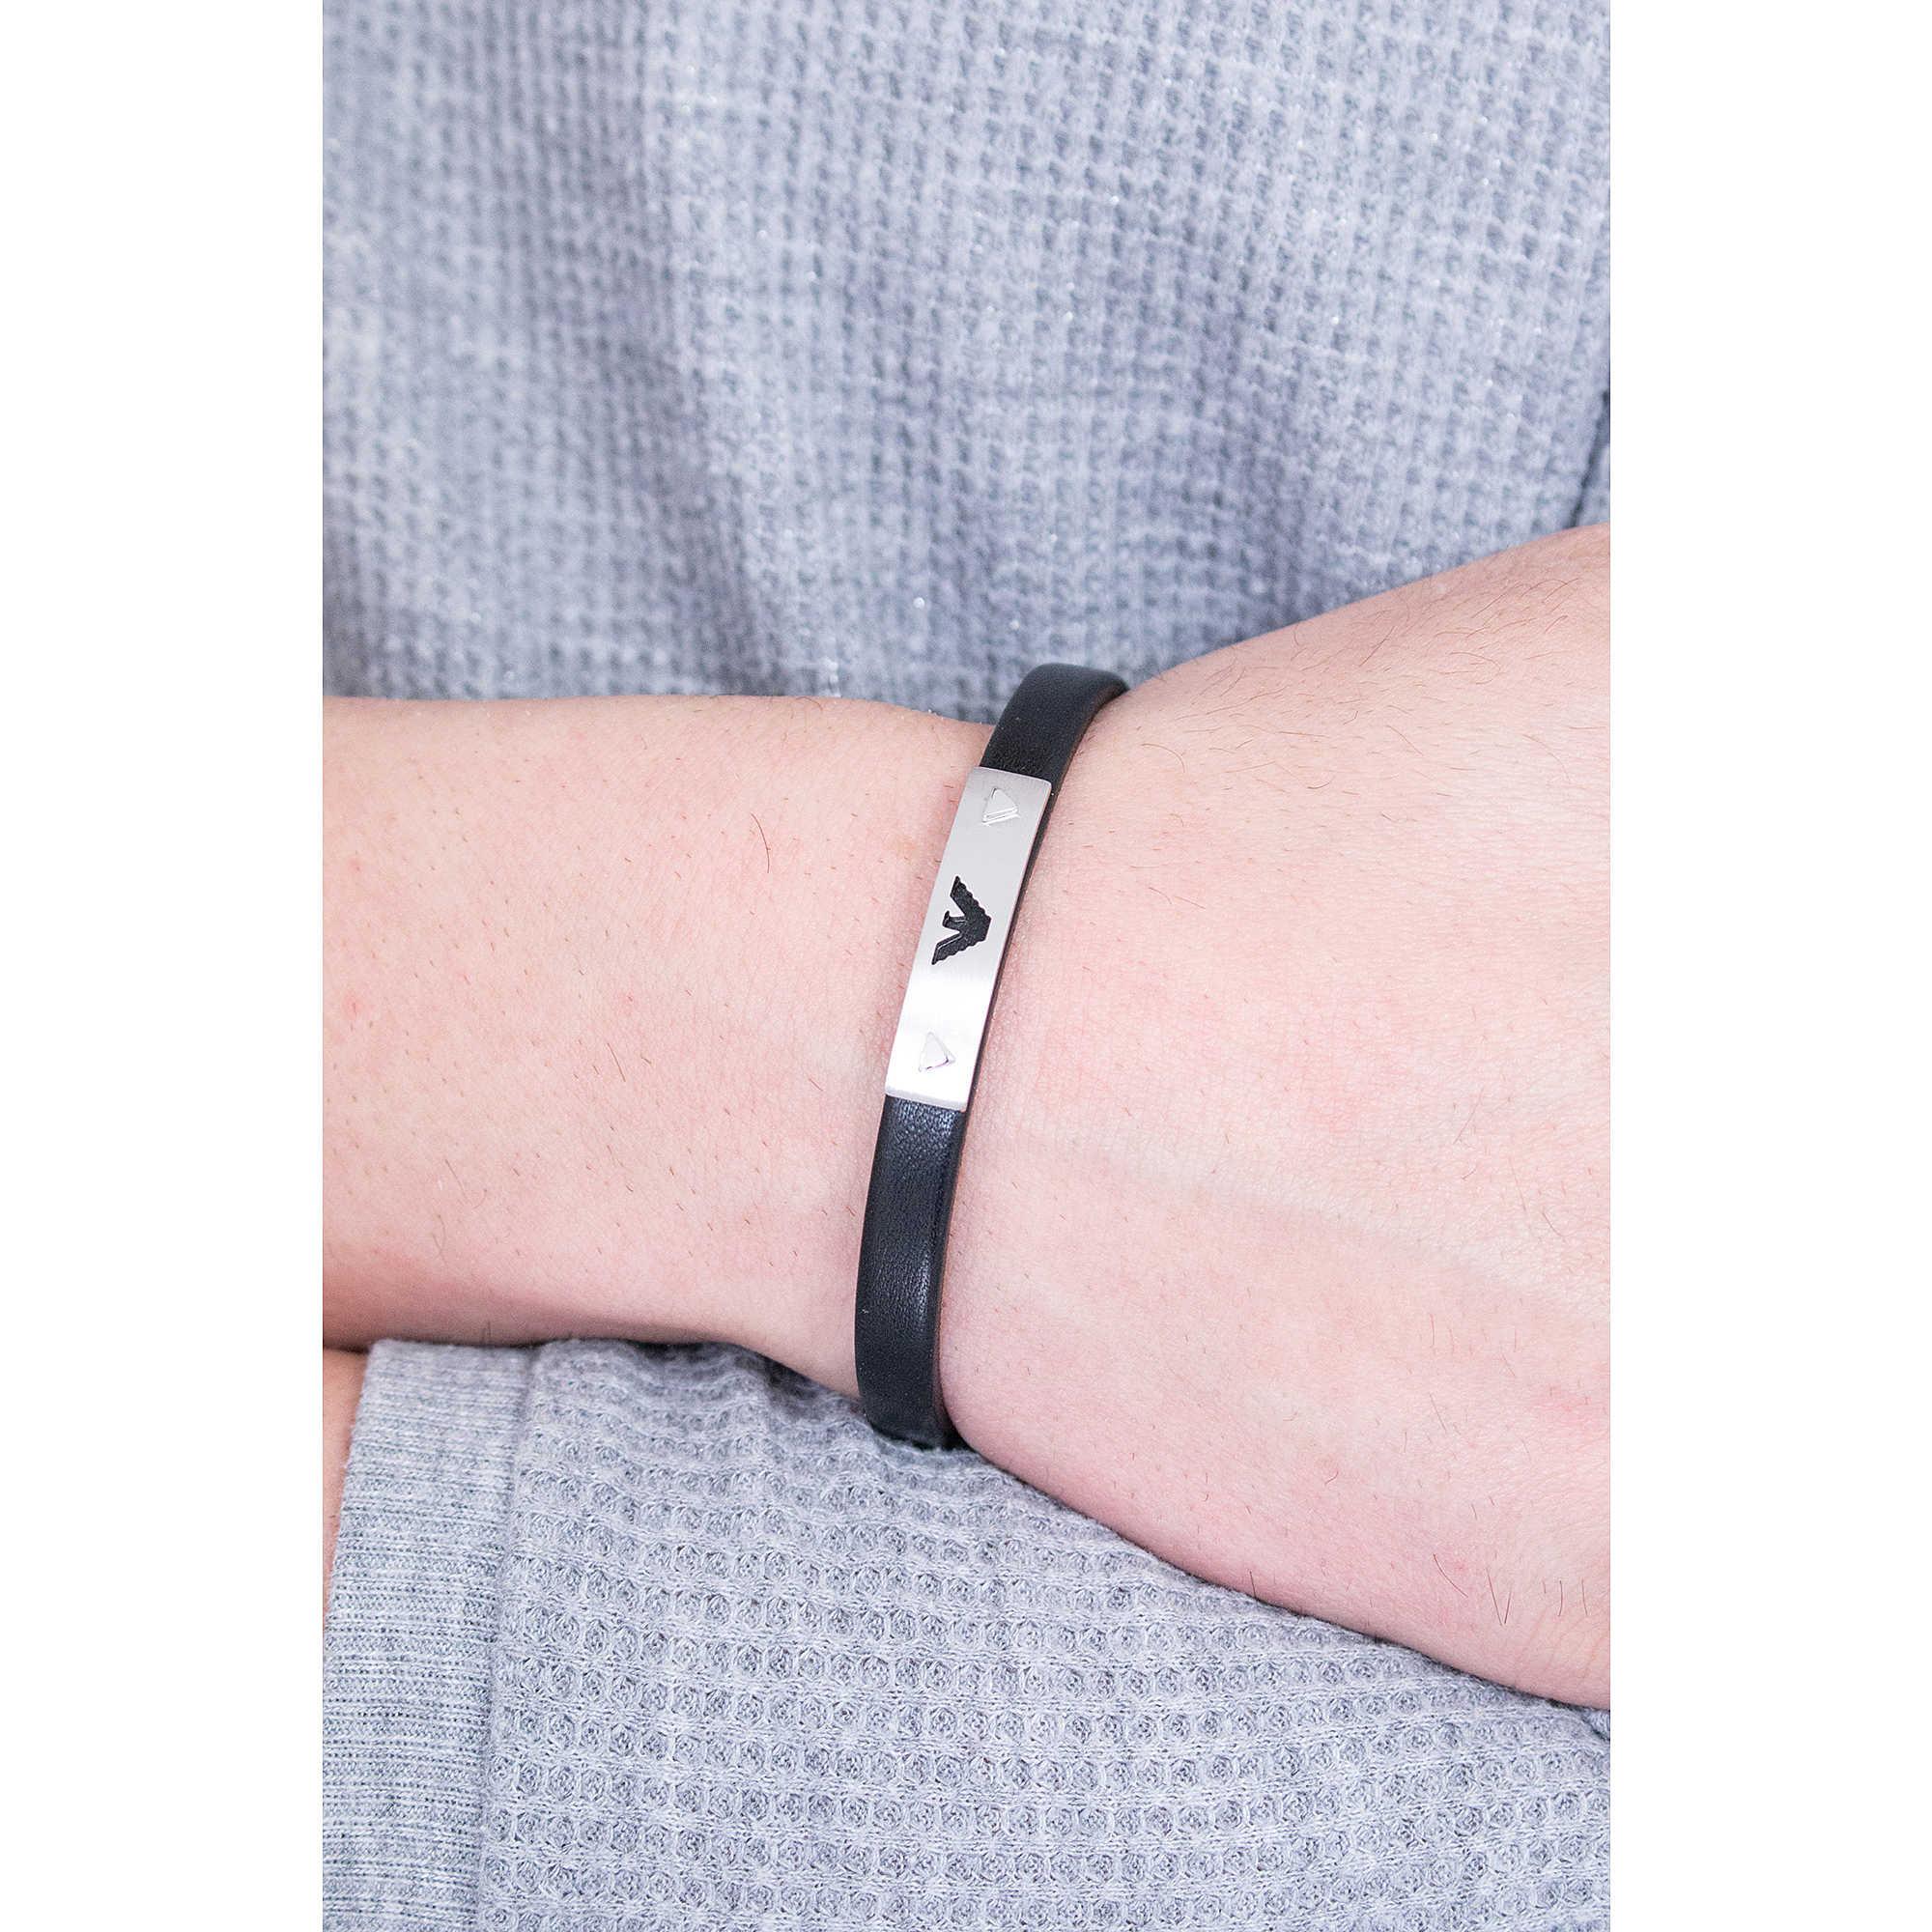 zoom. package bracelets Emporio Armani EGS2411040. zoom. bracelet man  jewellery Emporio Armani EGS2411040 ca7e675ff8c